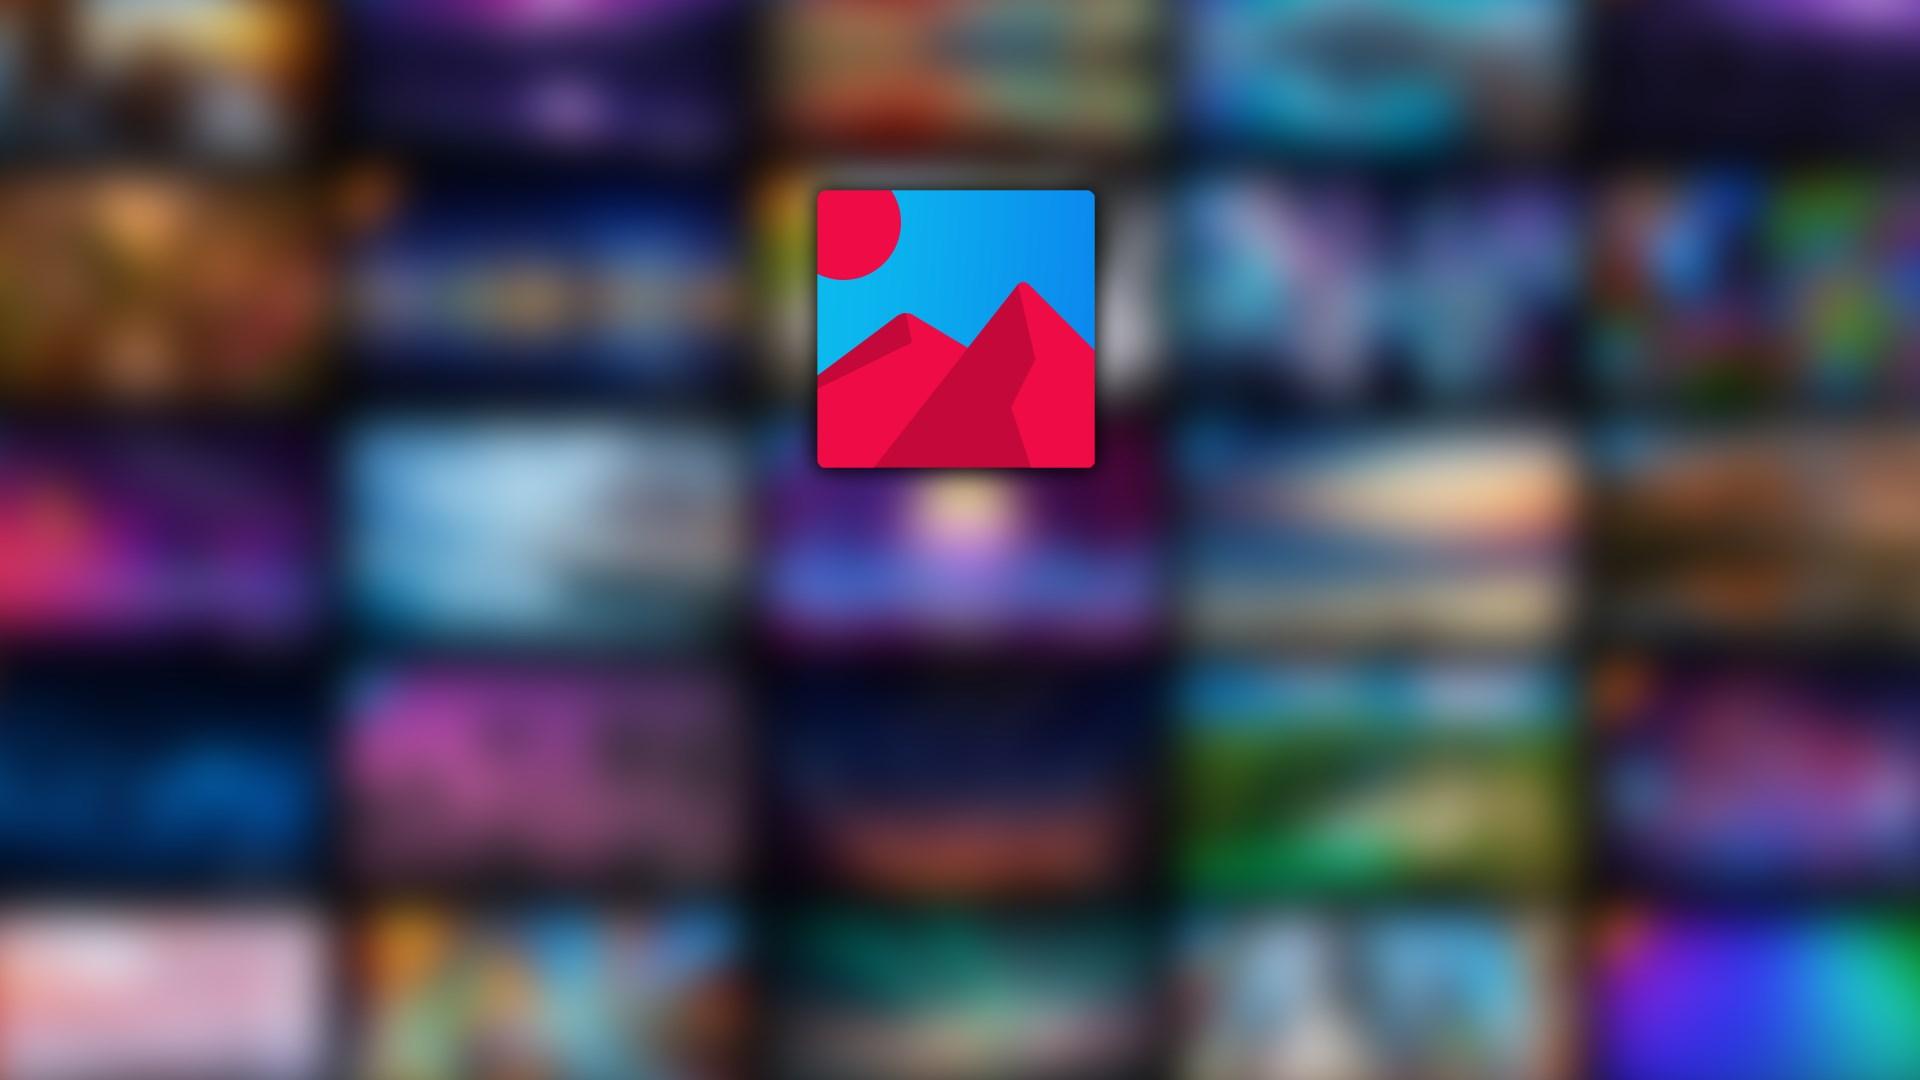 Minimalistic Digital Download Dec 2021 Digital Wallpaper Desktop Background Dated Jan White Instant Download